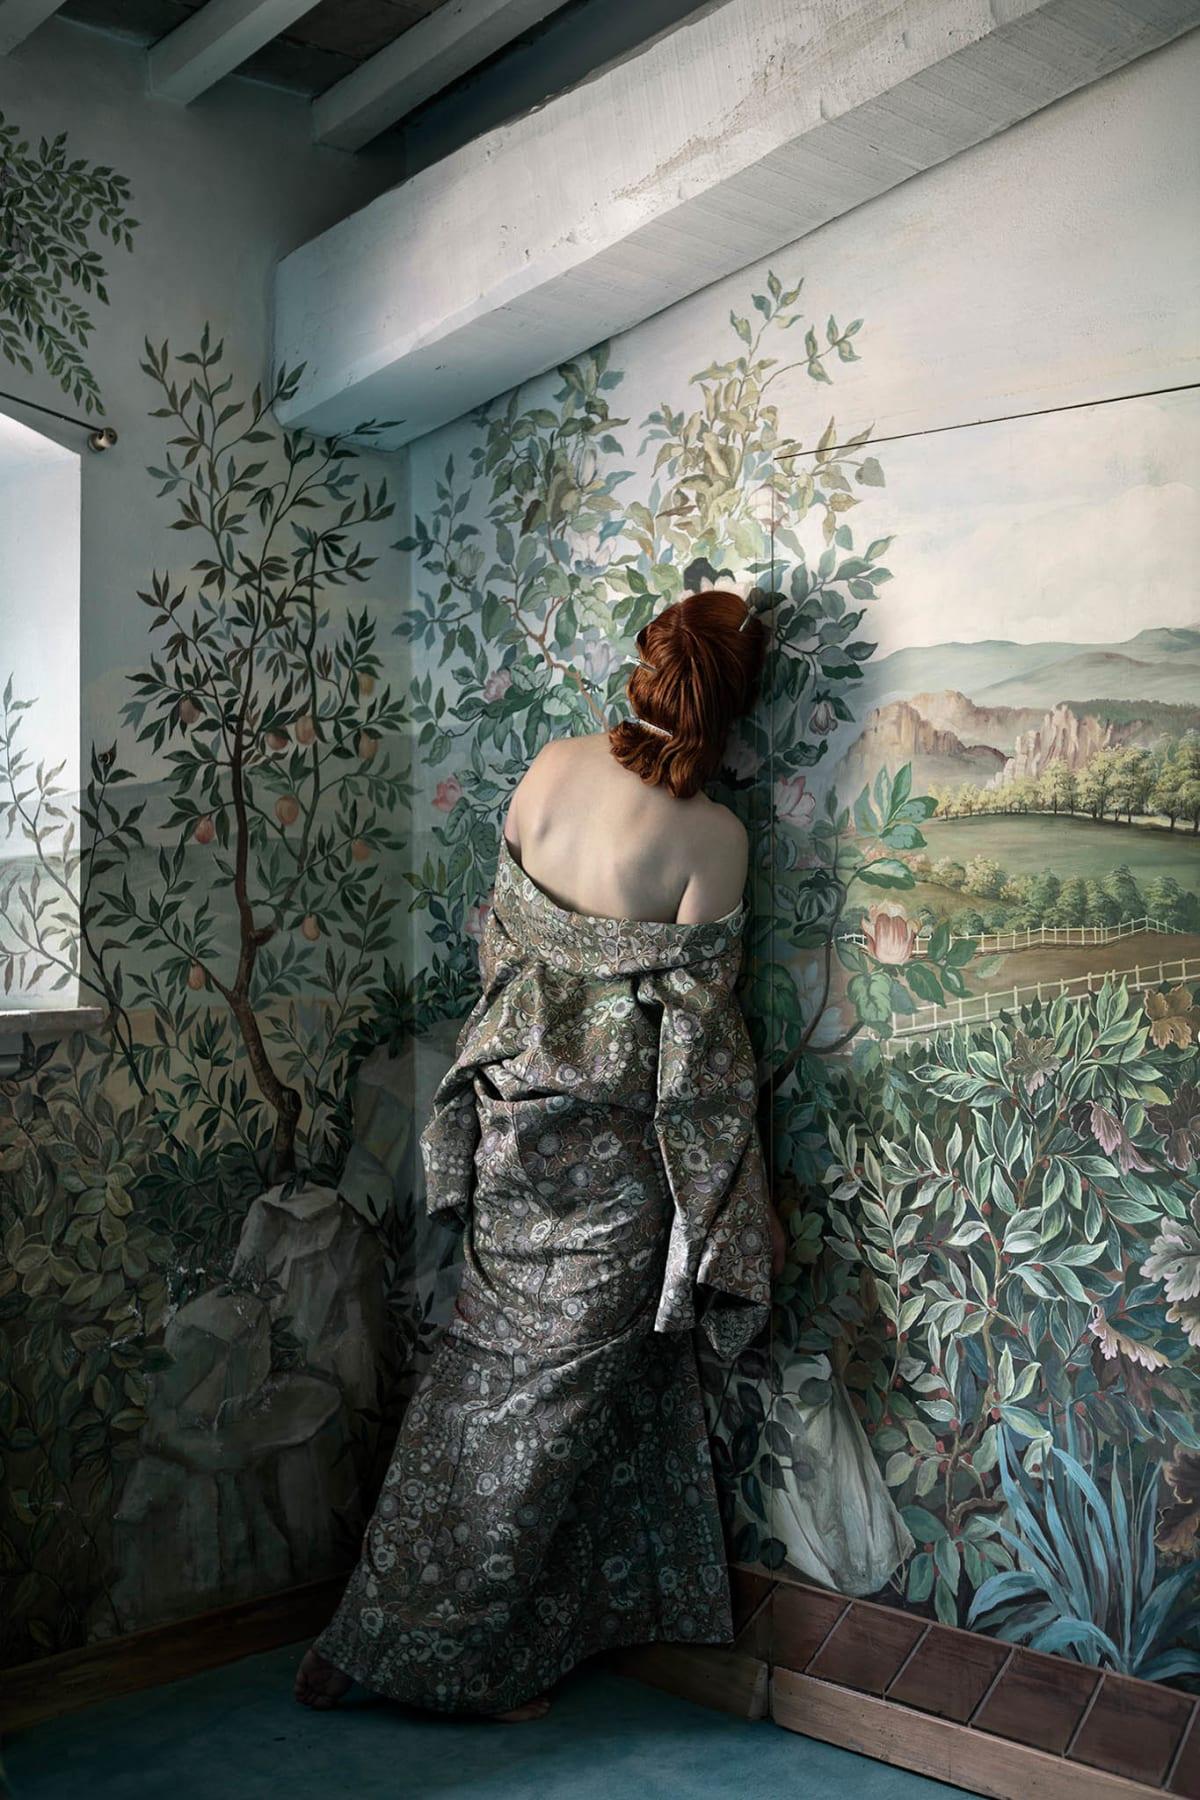 Anja Niemi, TWWNE / The Flower Room, 2016